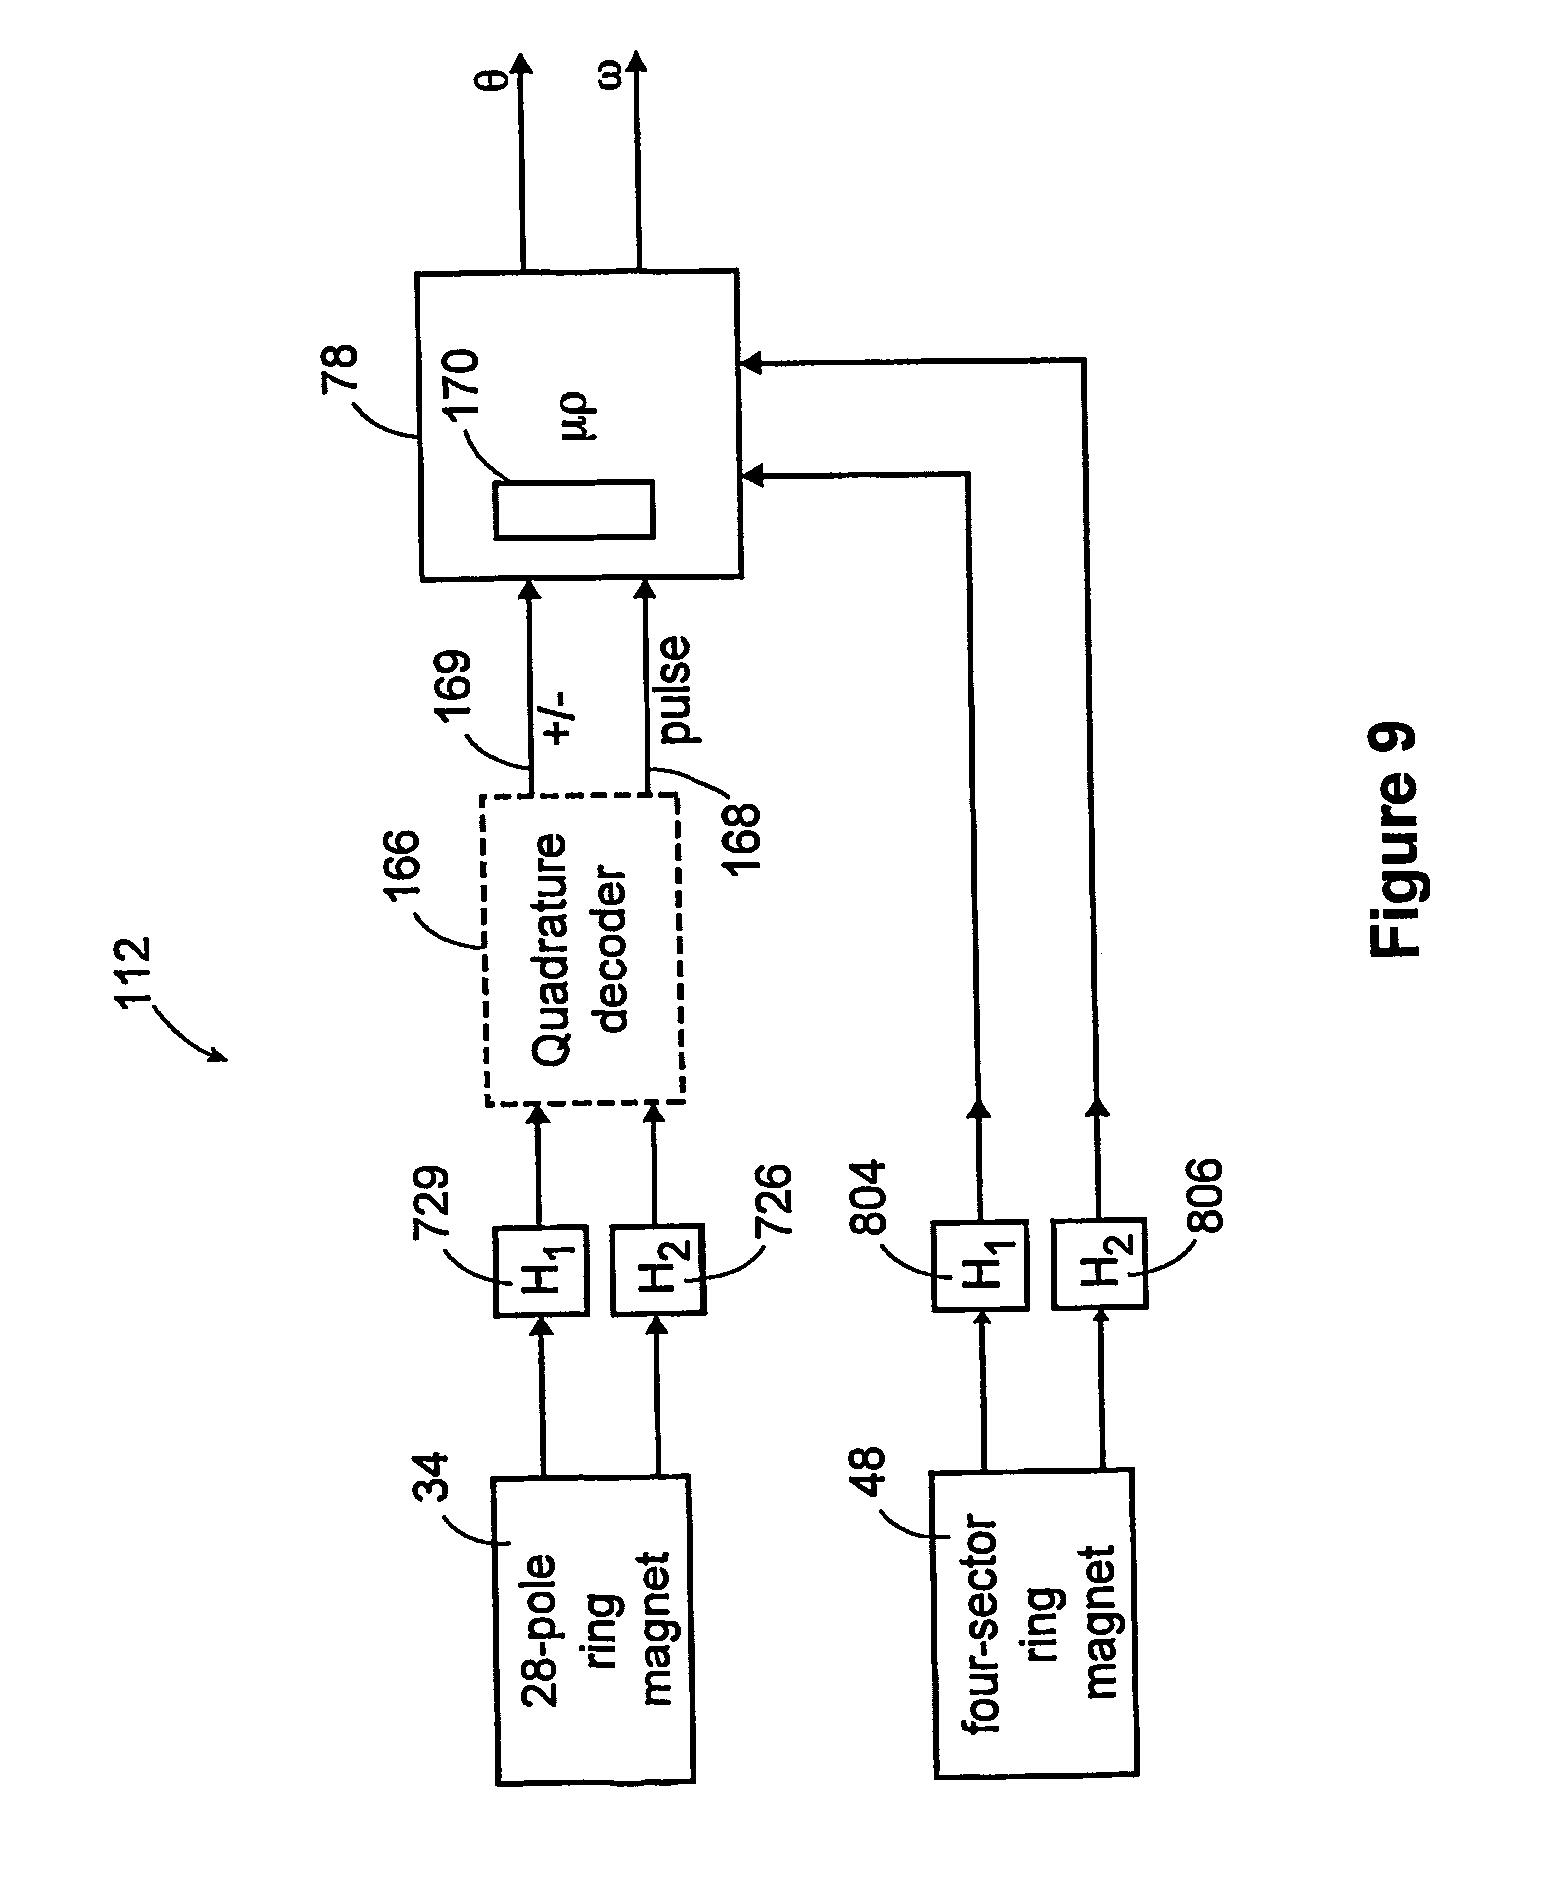 Valeo Wiper Motor Wiring Diagram : 32 Wiring Diagram